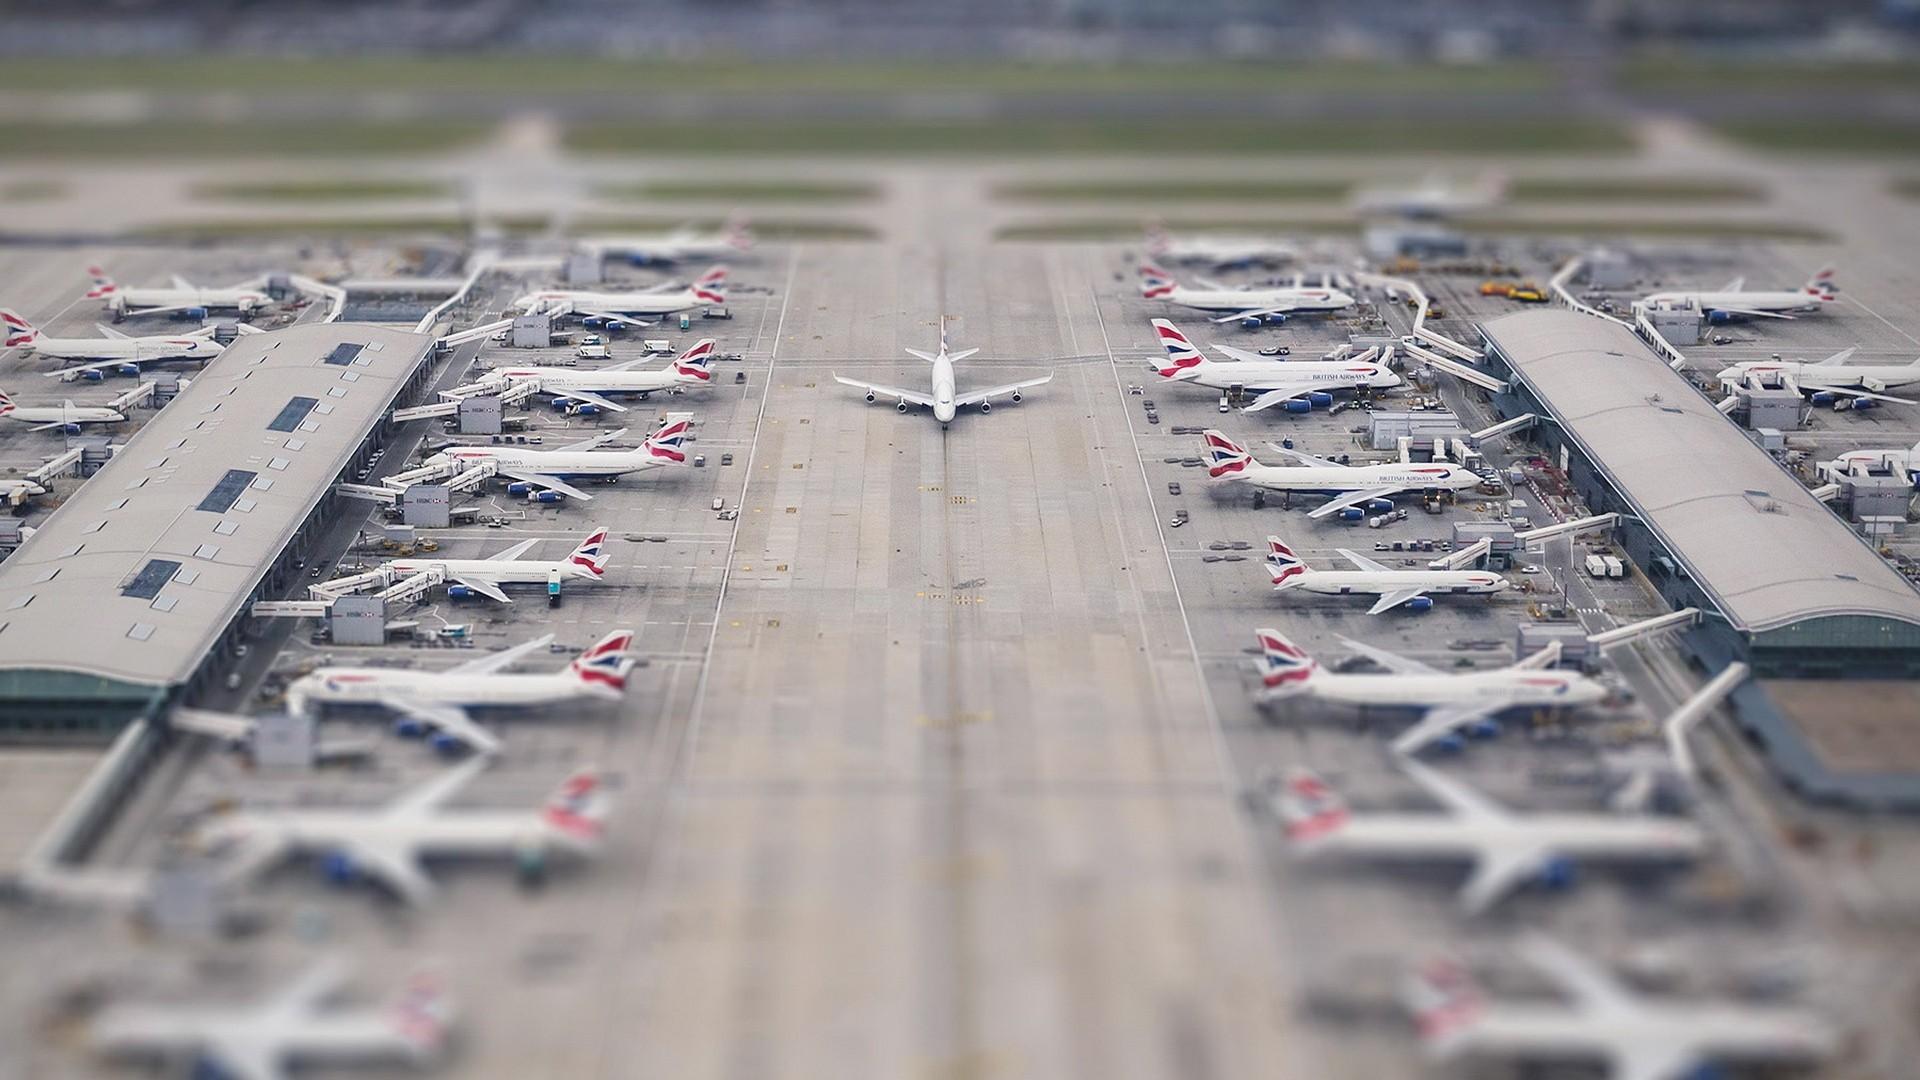 General-1920x1080-airport-airplane-tilt-shift-wallpaper-wpc9205390